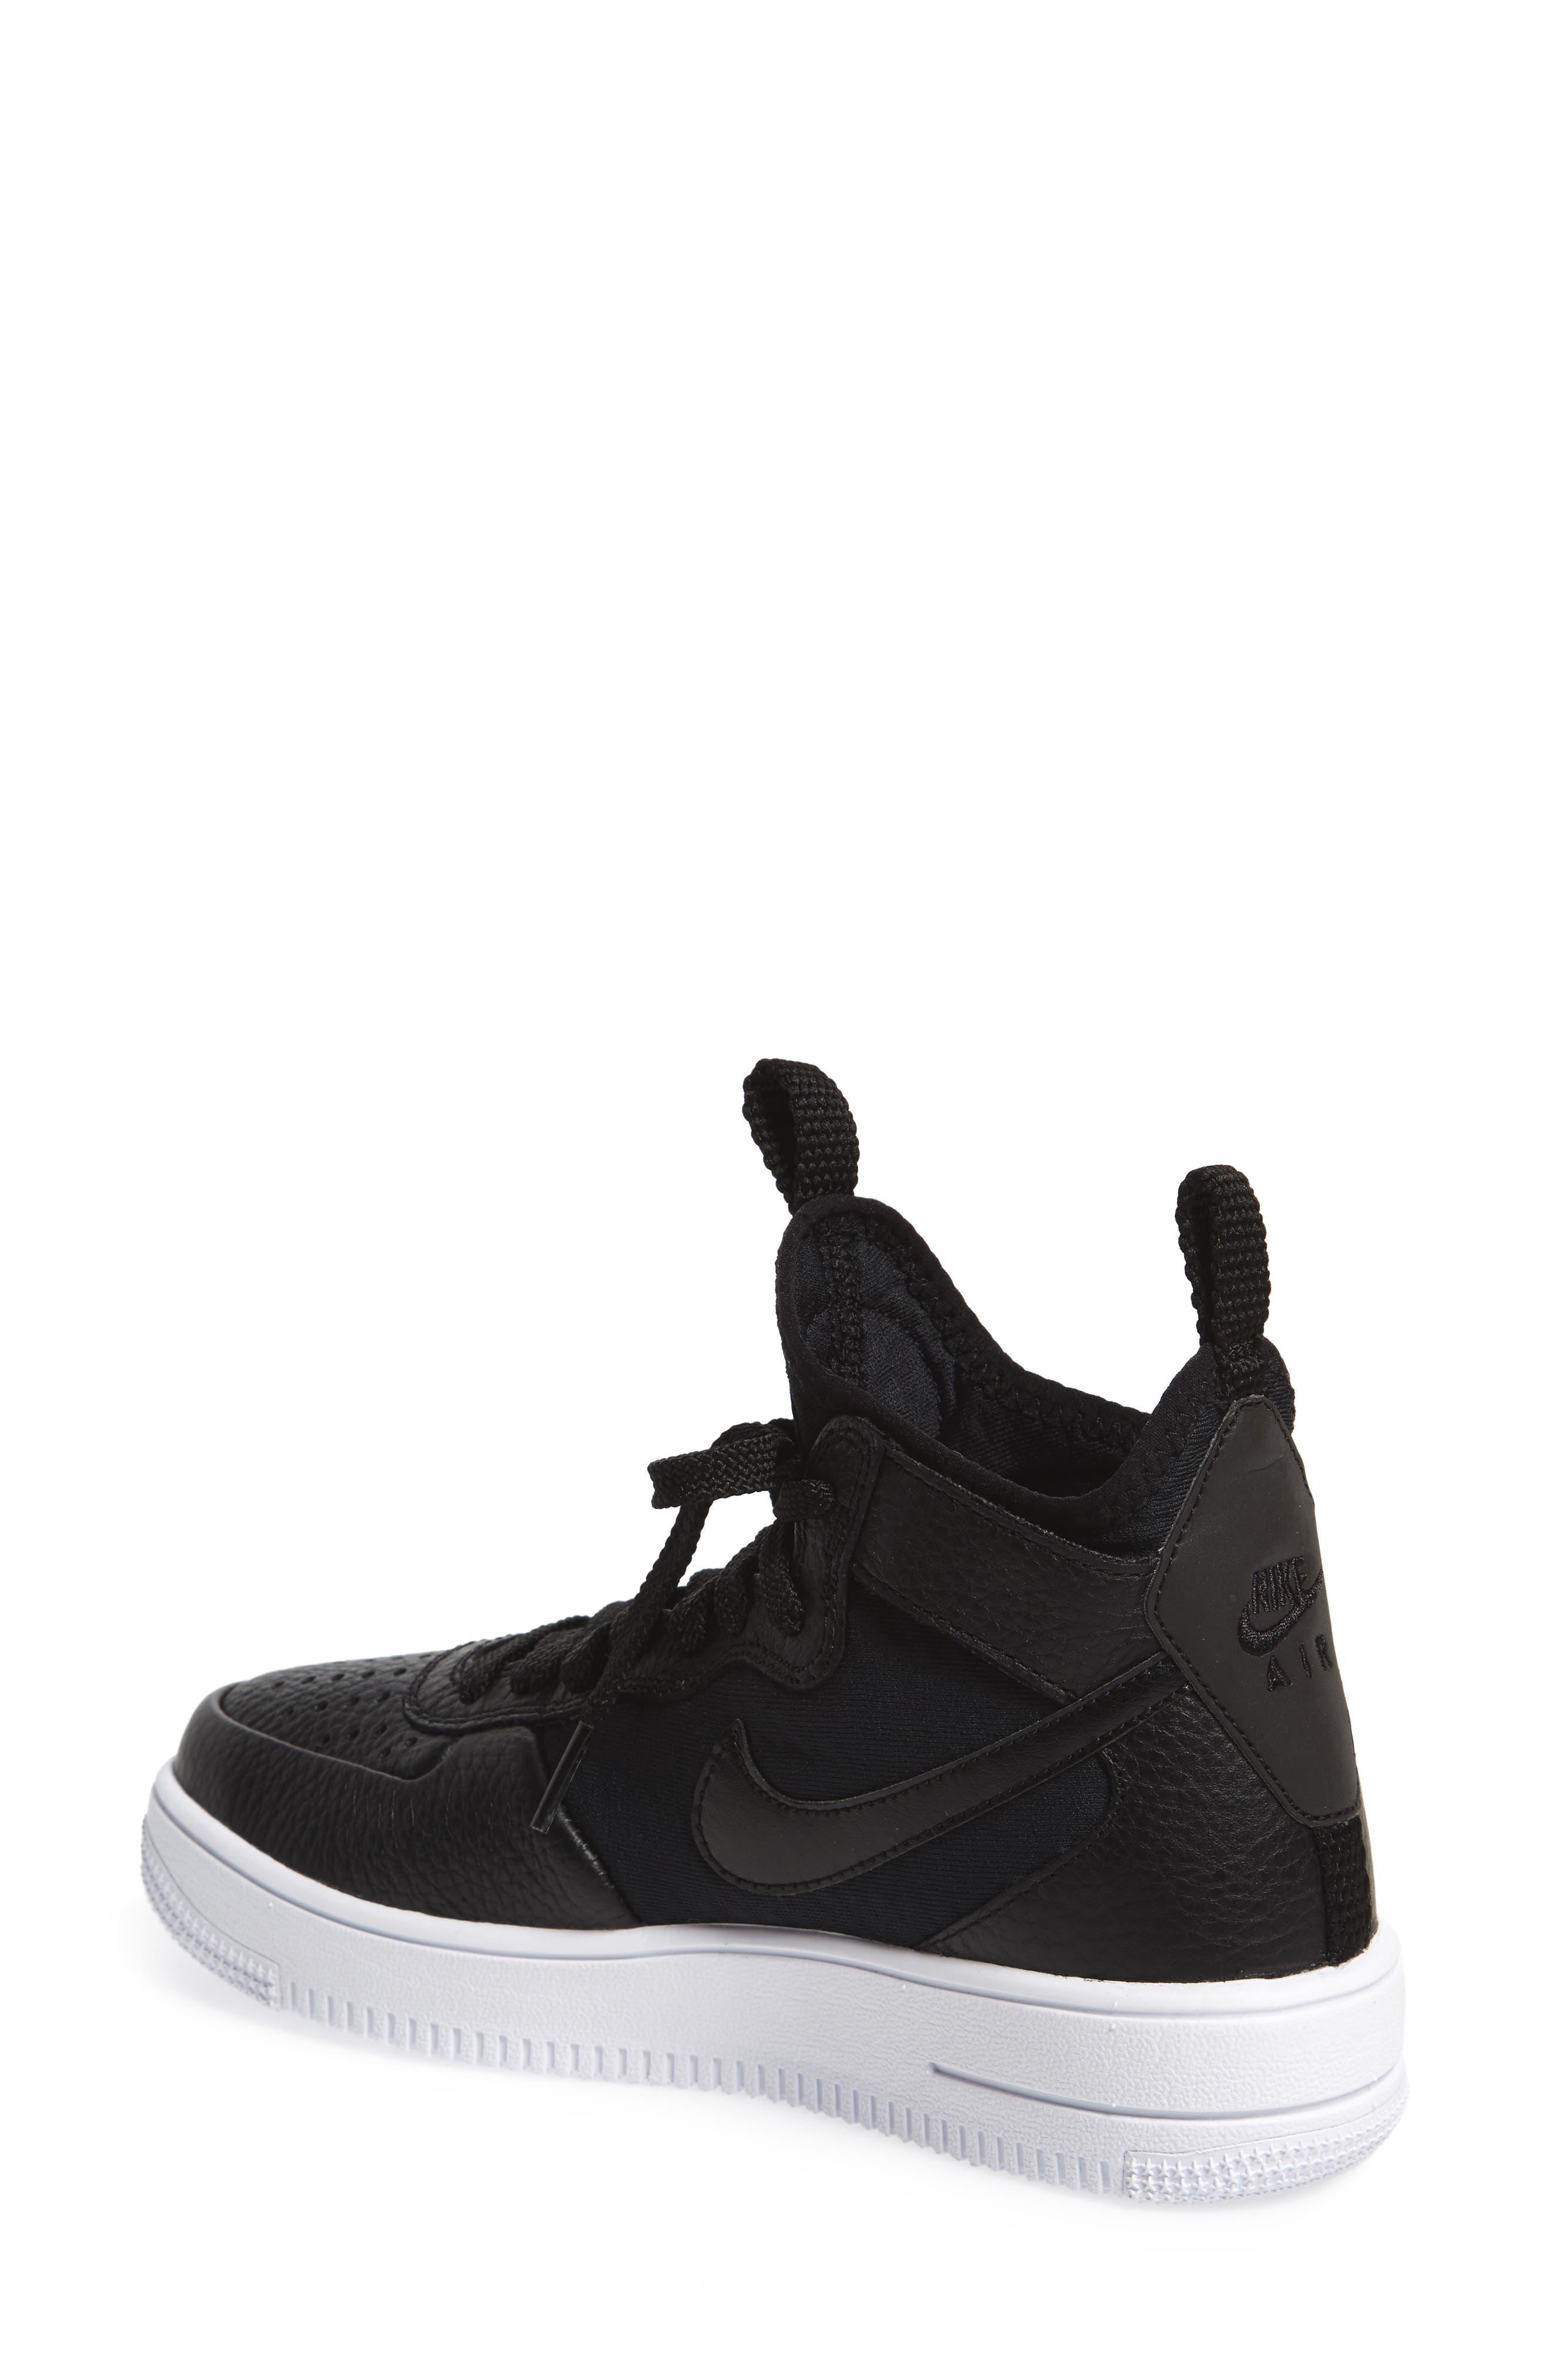 Air Force 1 Ultraforce Mid Sneaker,                             Alternate thumbnail 2, color,                             005